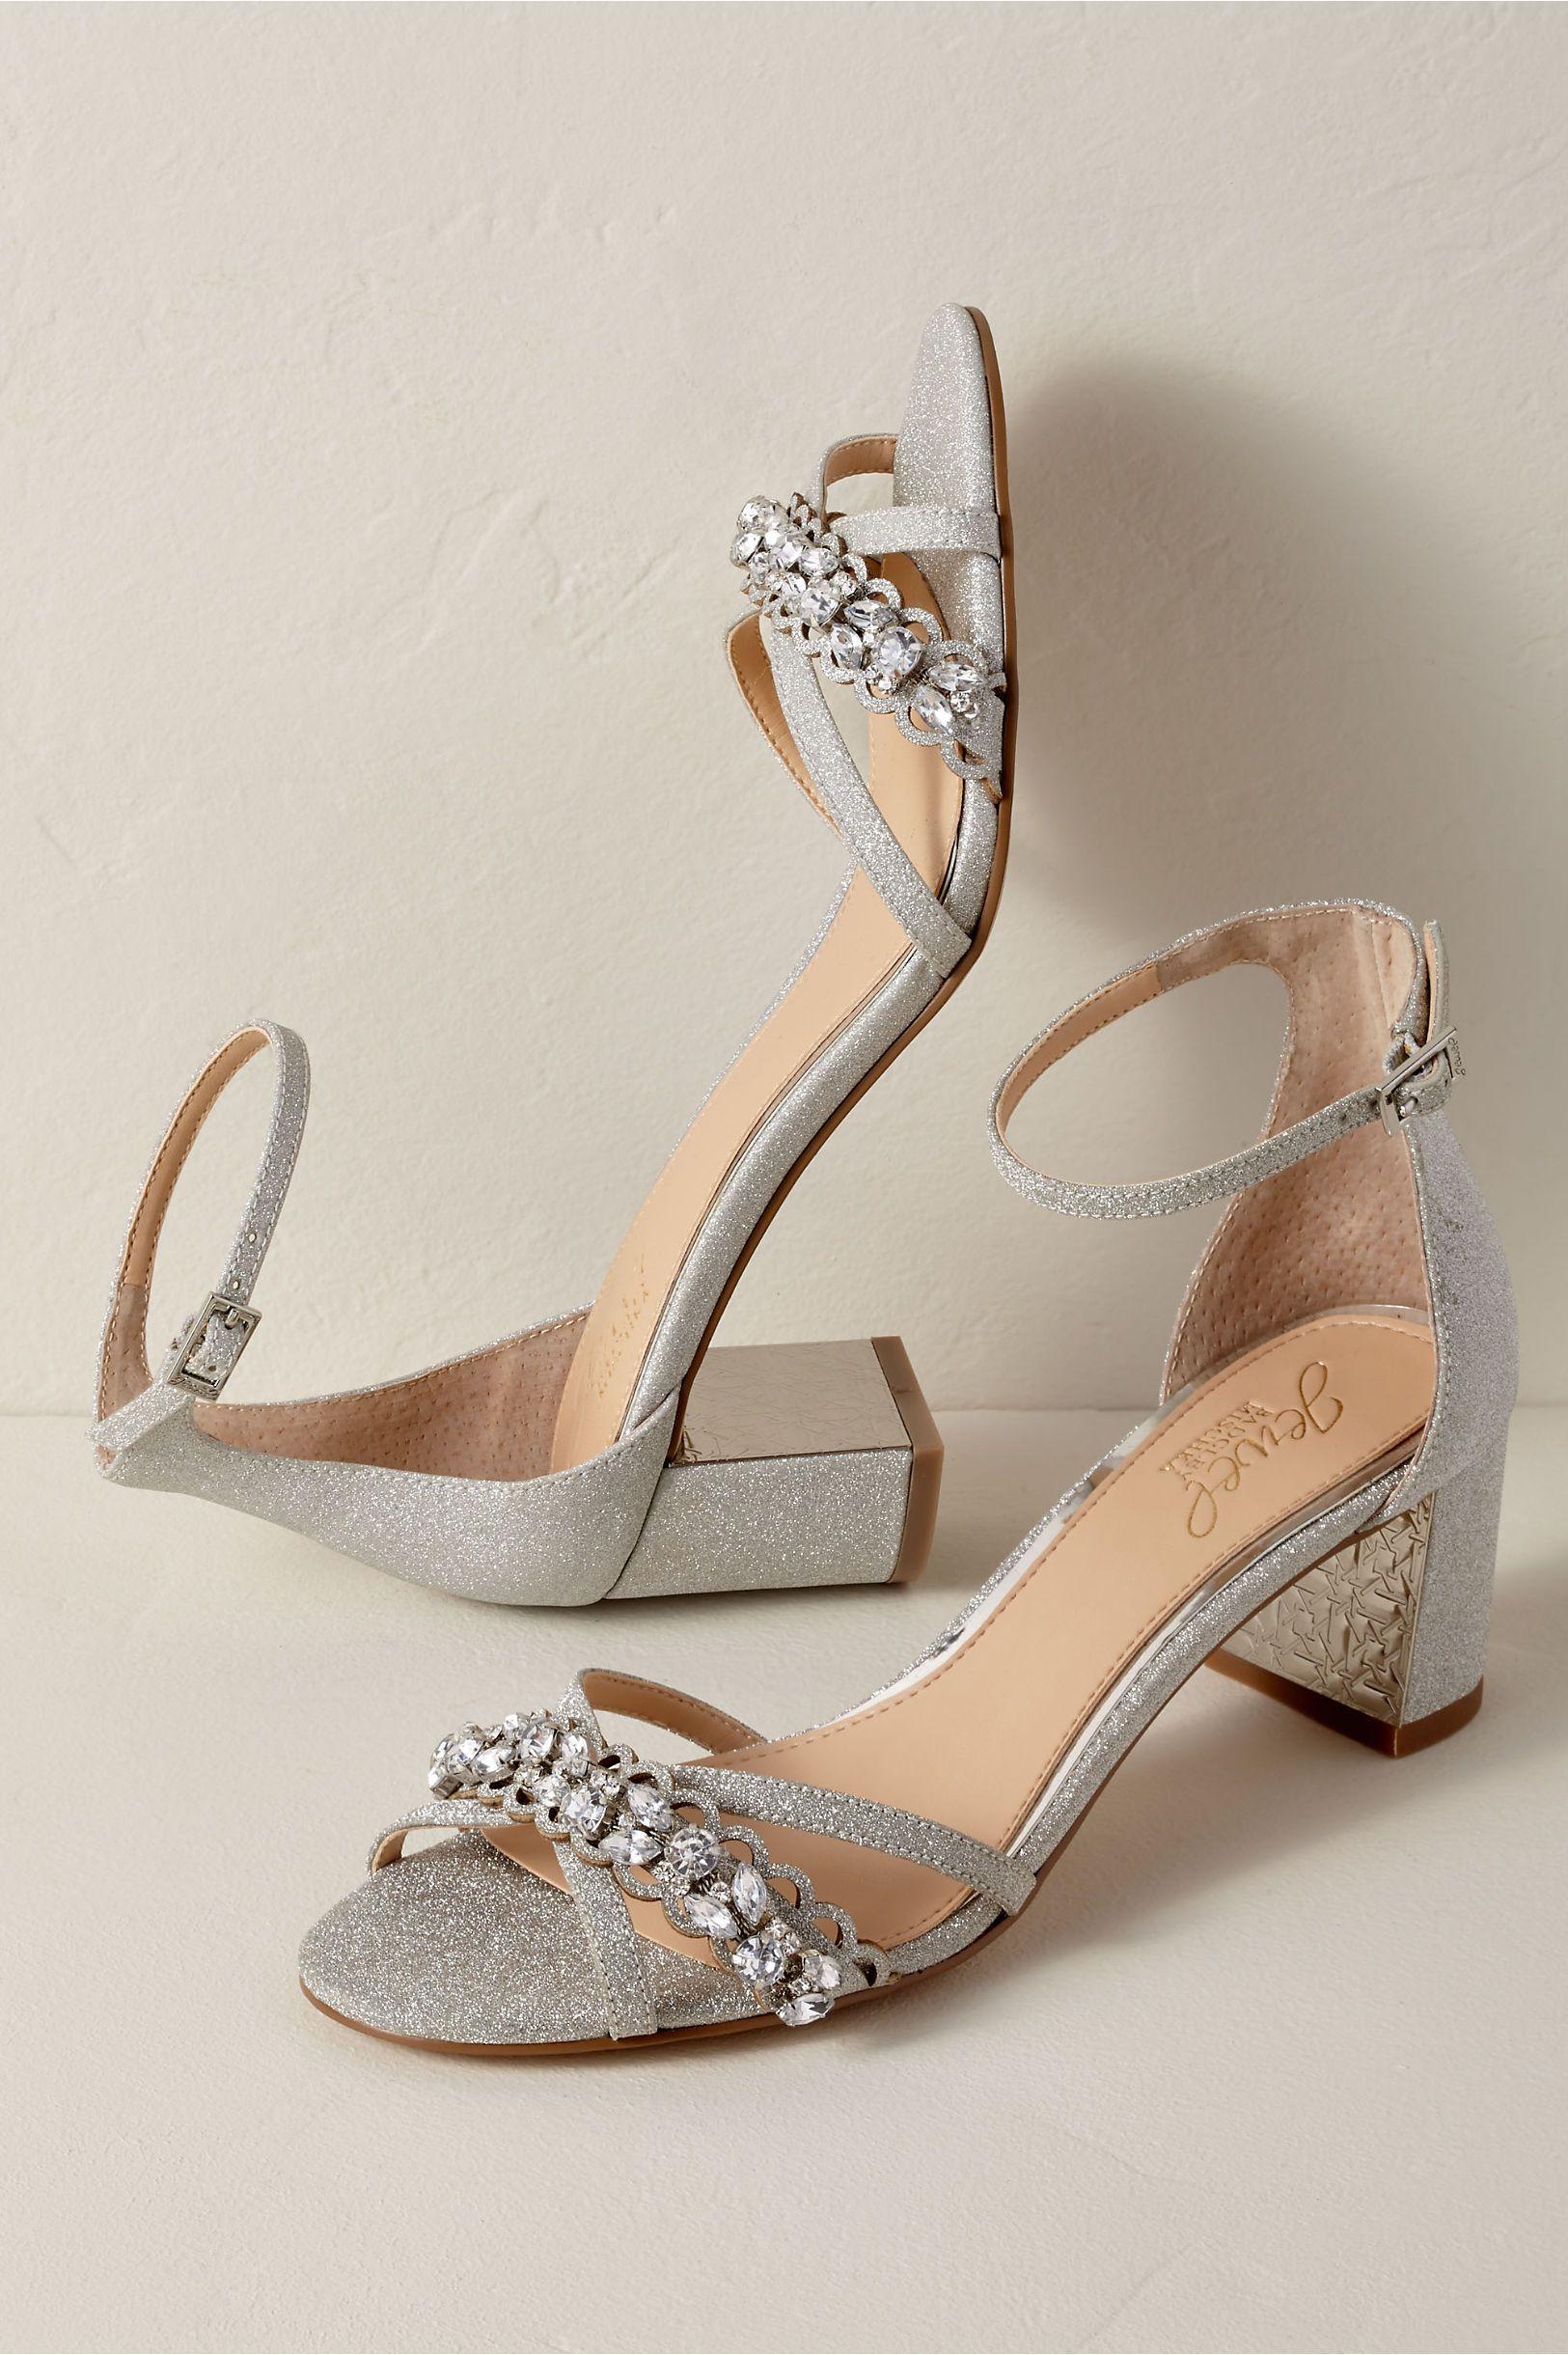 c2a18caef17f BHLDN's Badgley Mischka Jewel by Badgley Mischka Giona Block Heels in Silver